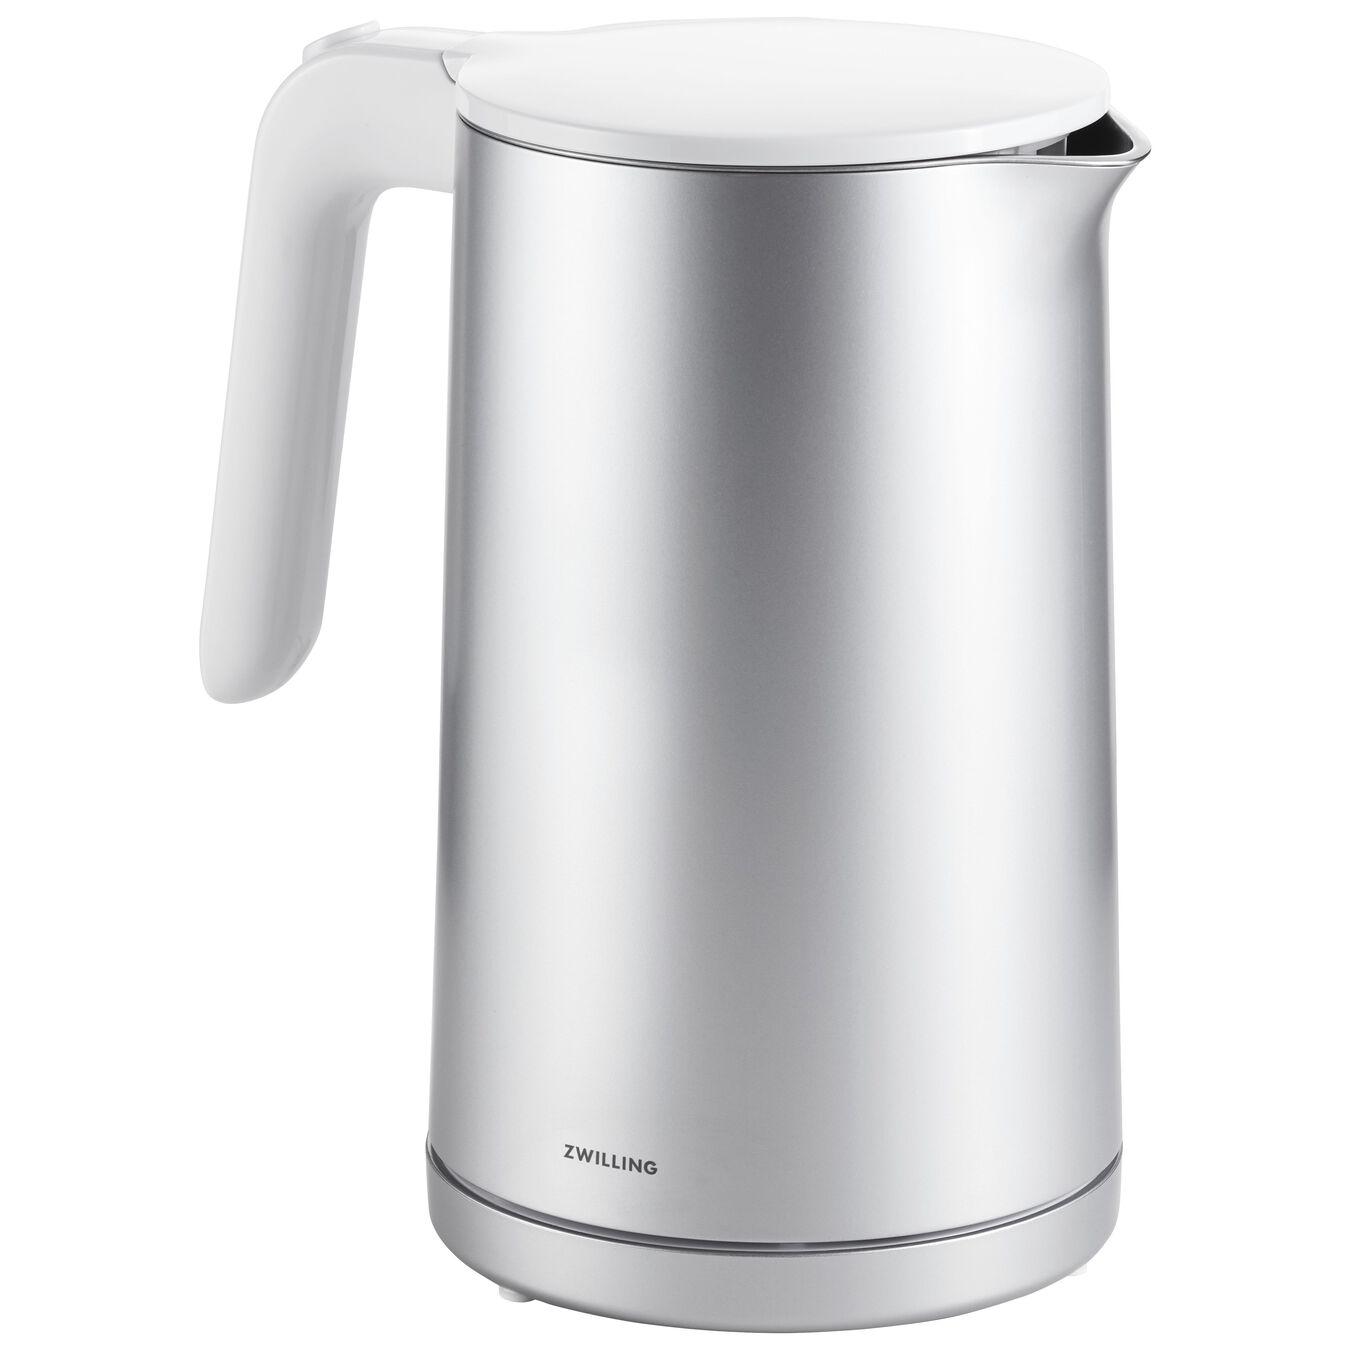 Wasserkocher, 1,5 l, Silber,,large 3